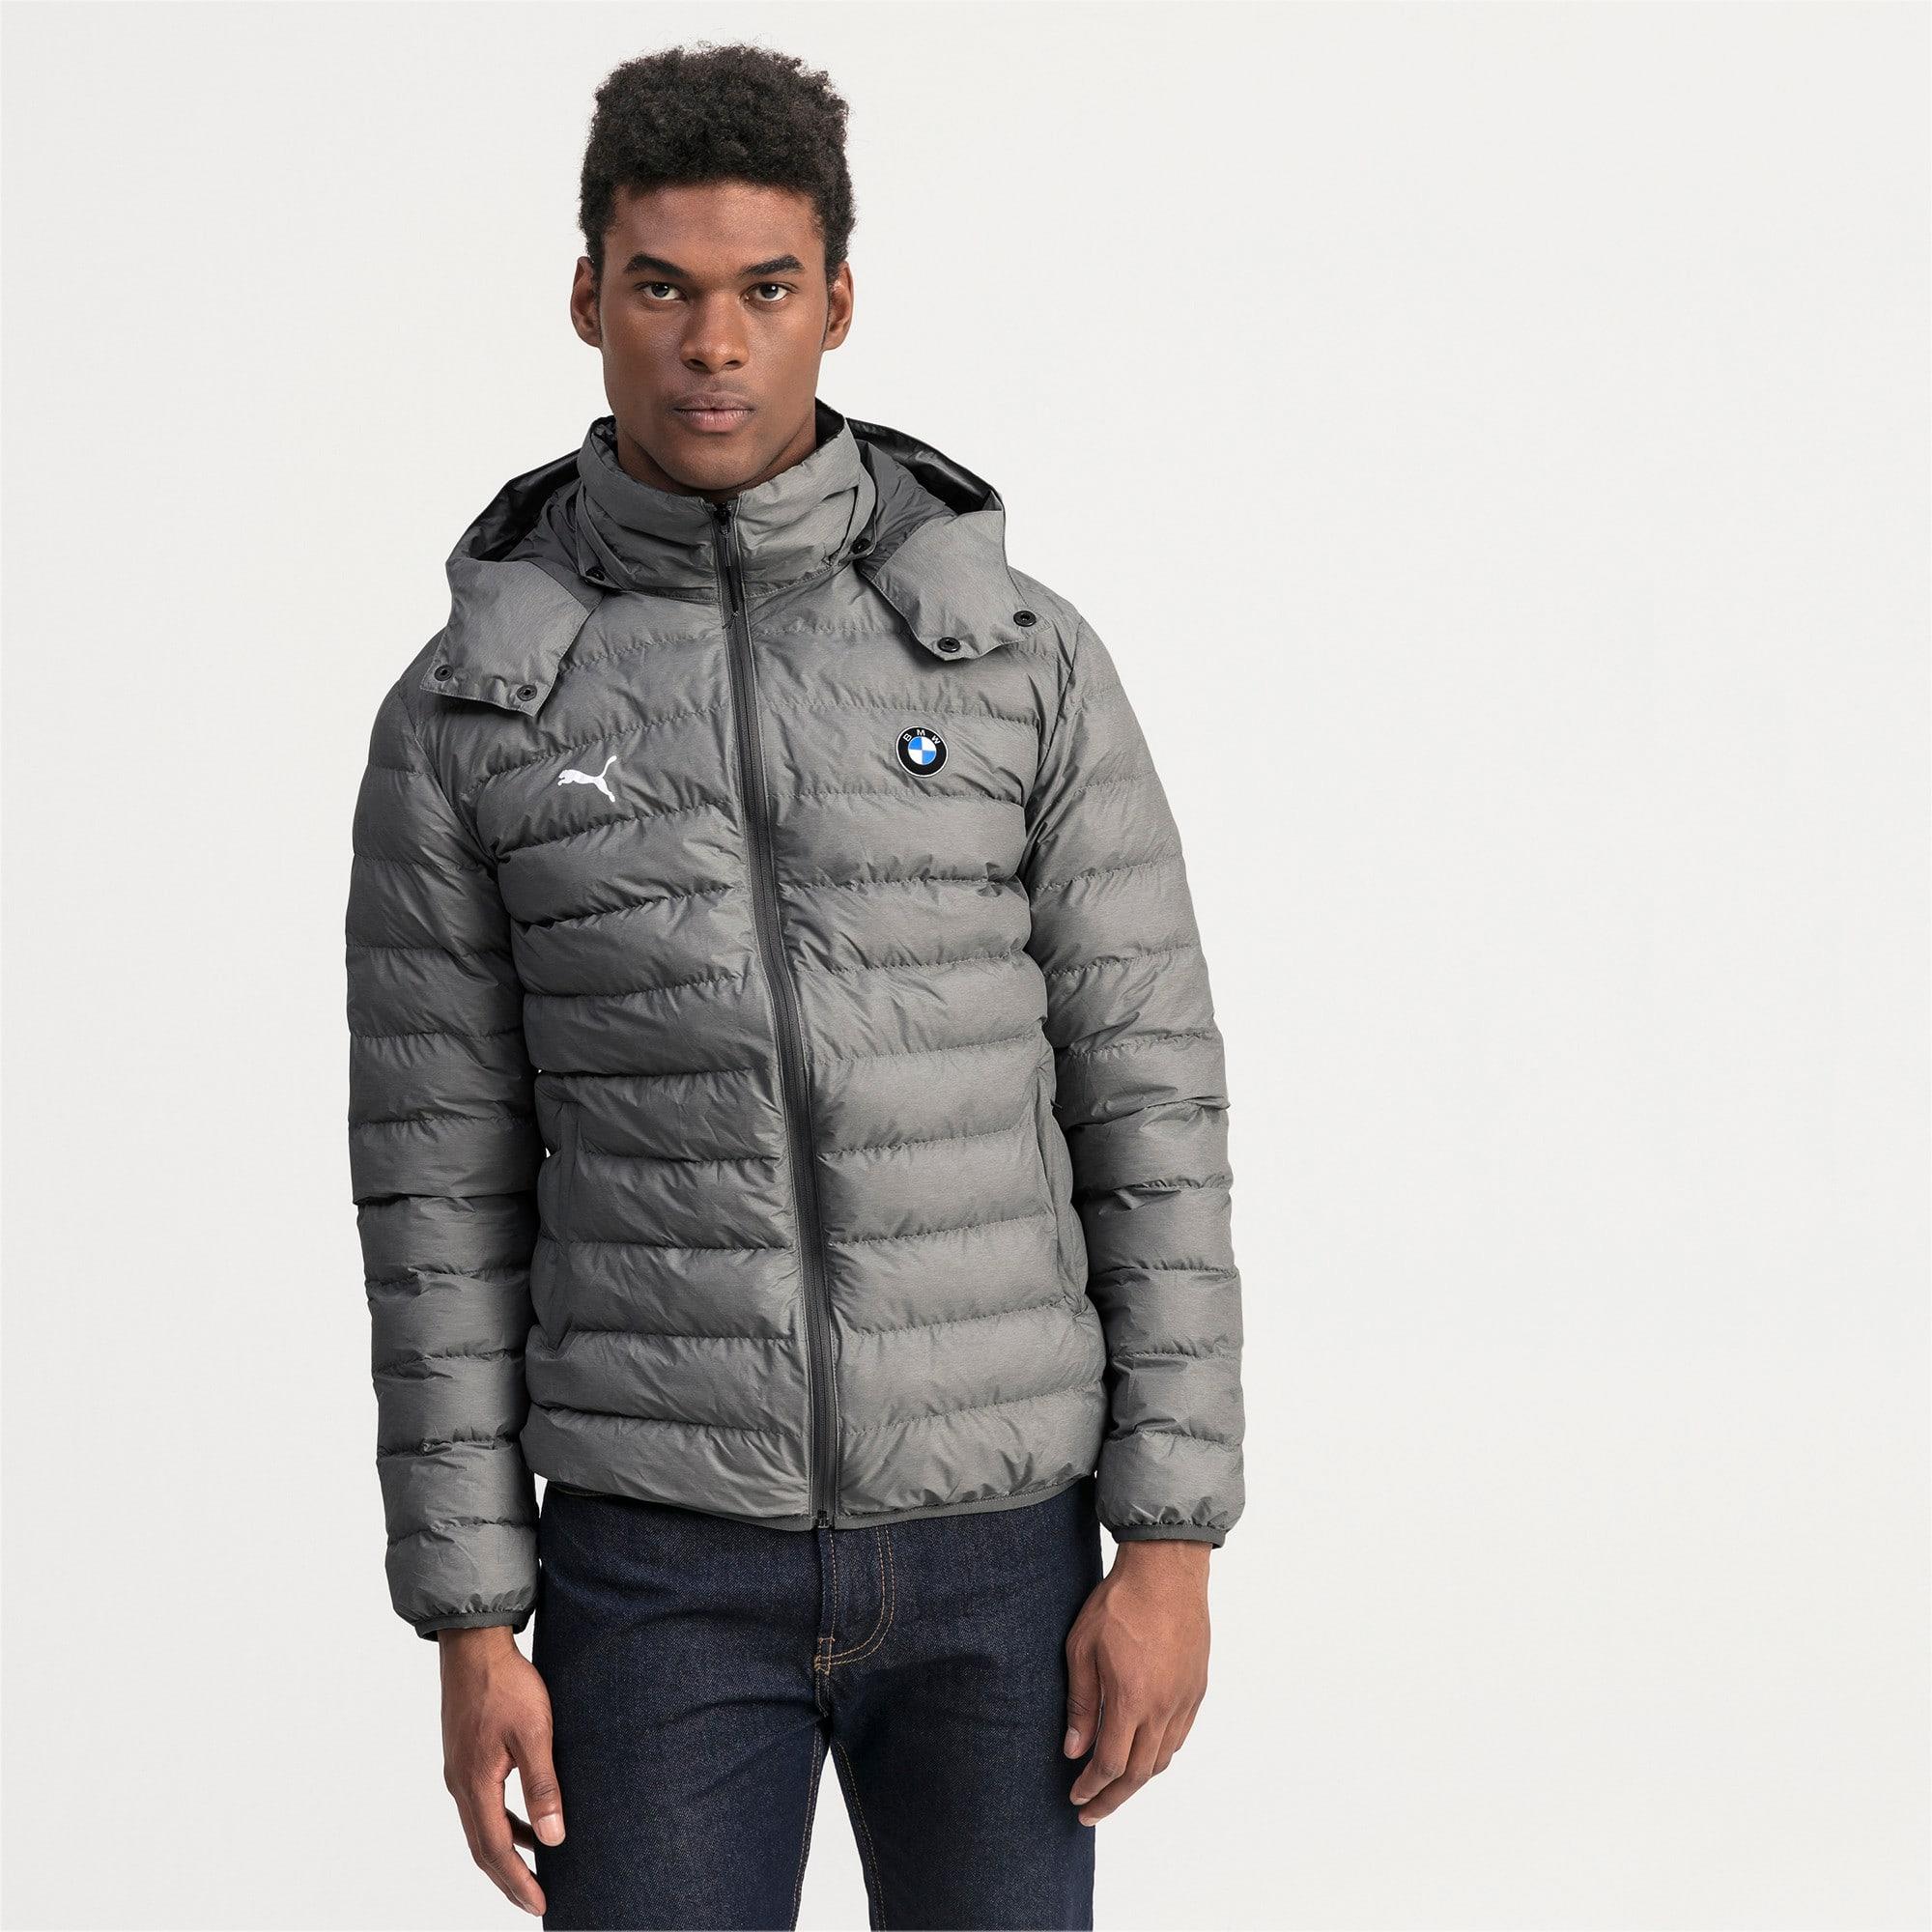 Thumbnail 1 of BMW Motorsport Eco PackLite Men's Jacket, Medium Gray Heather, medium